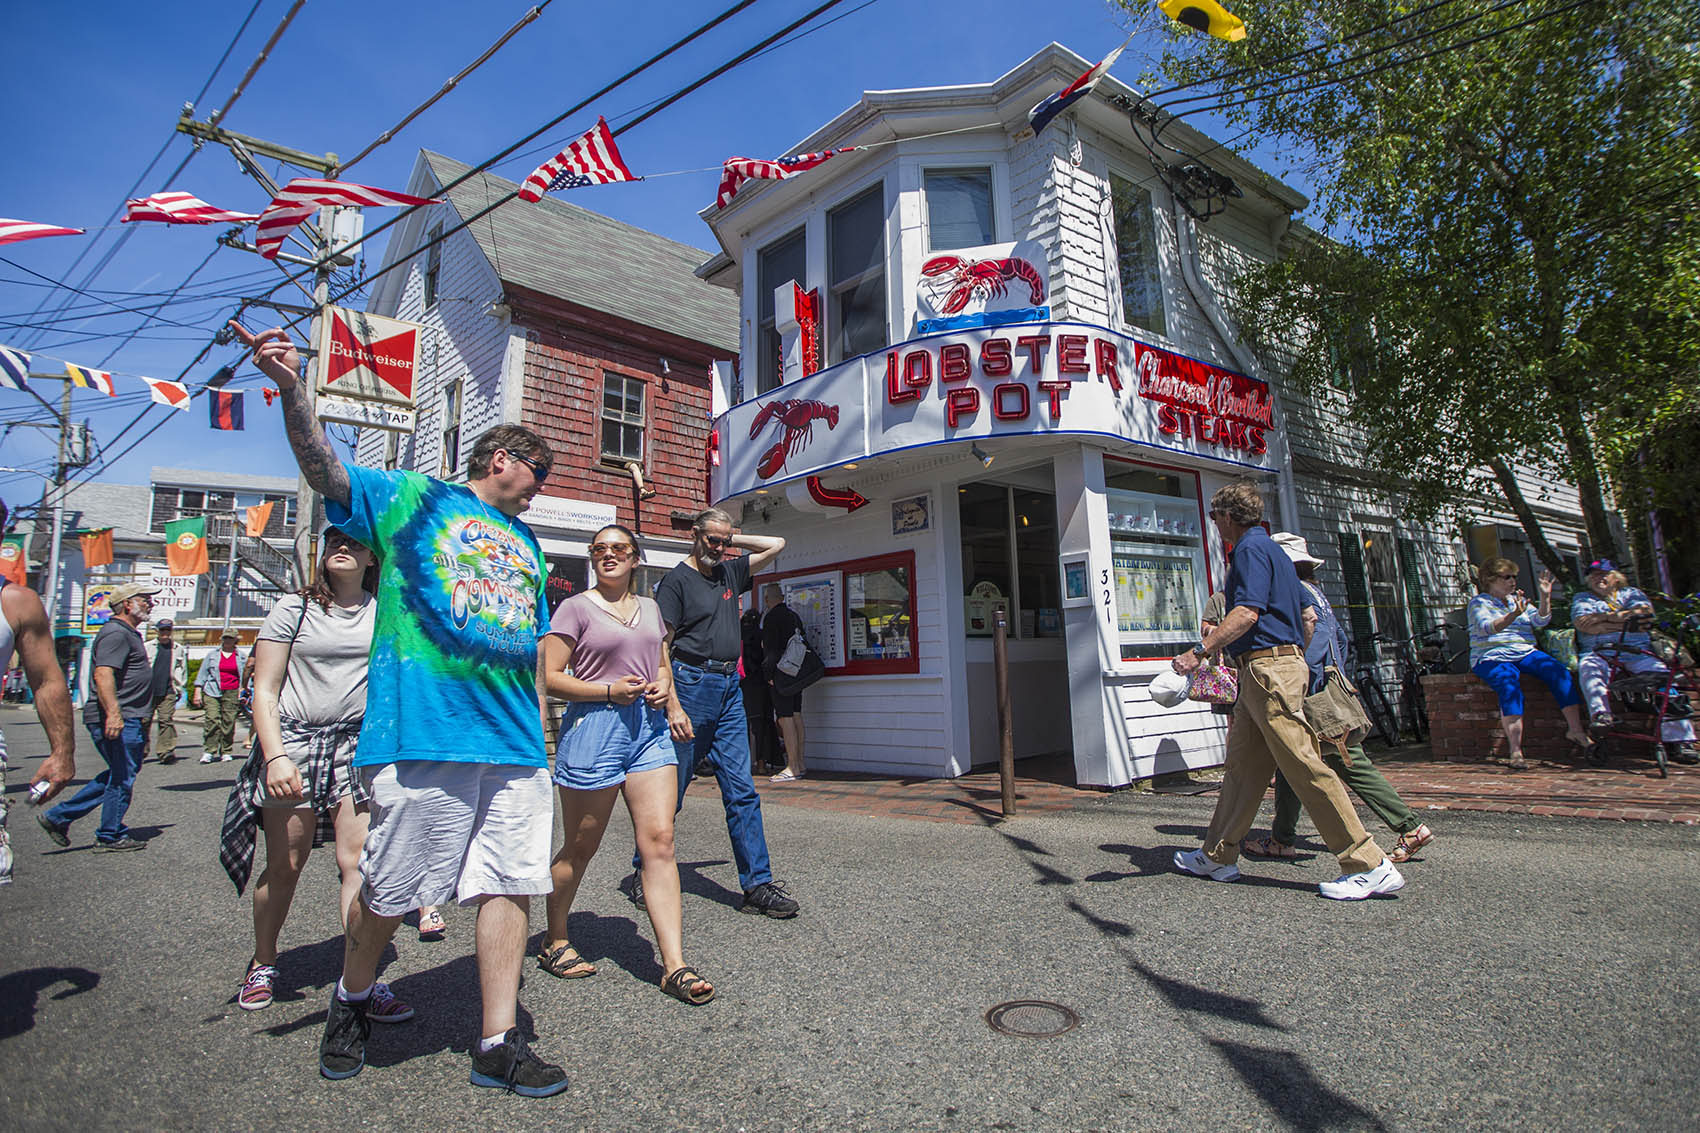 Tourists walk down Commercial Street in Provincetown. (Jesse Costa/WBUR)